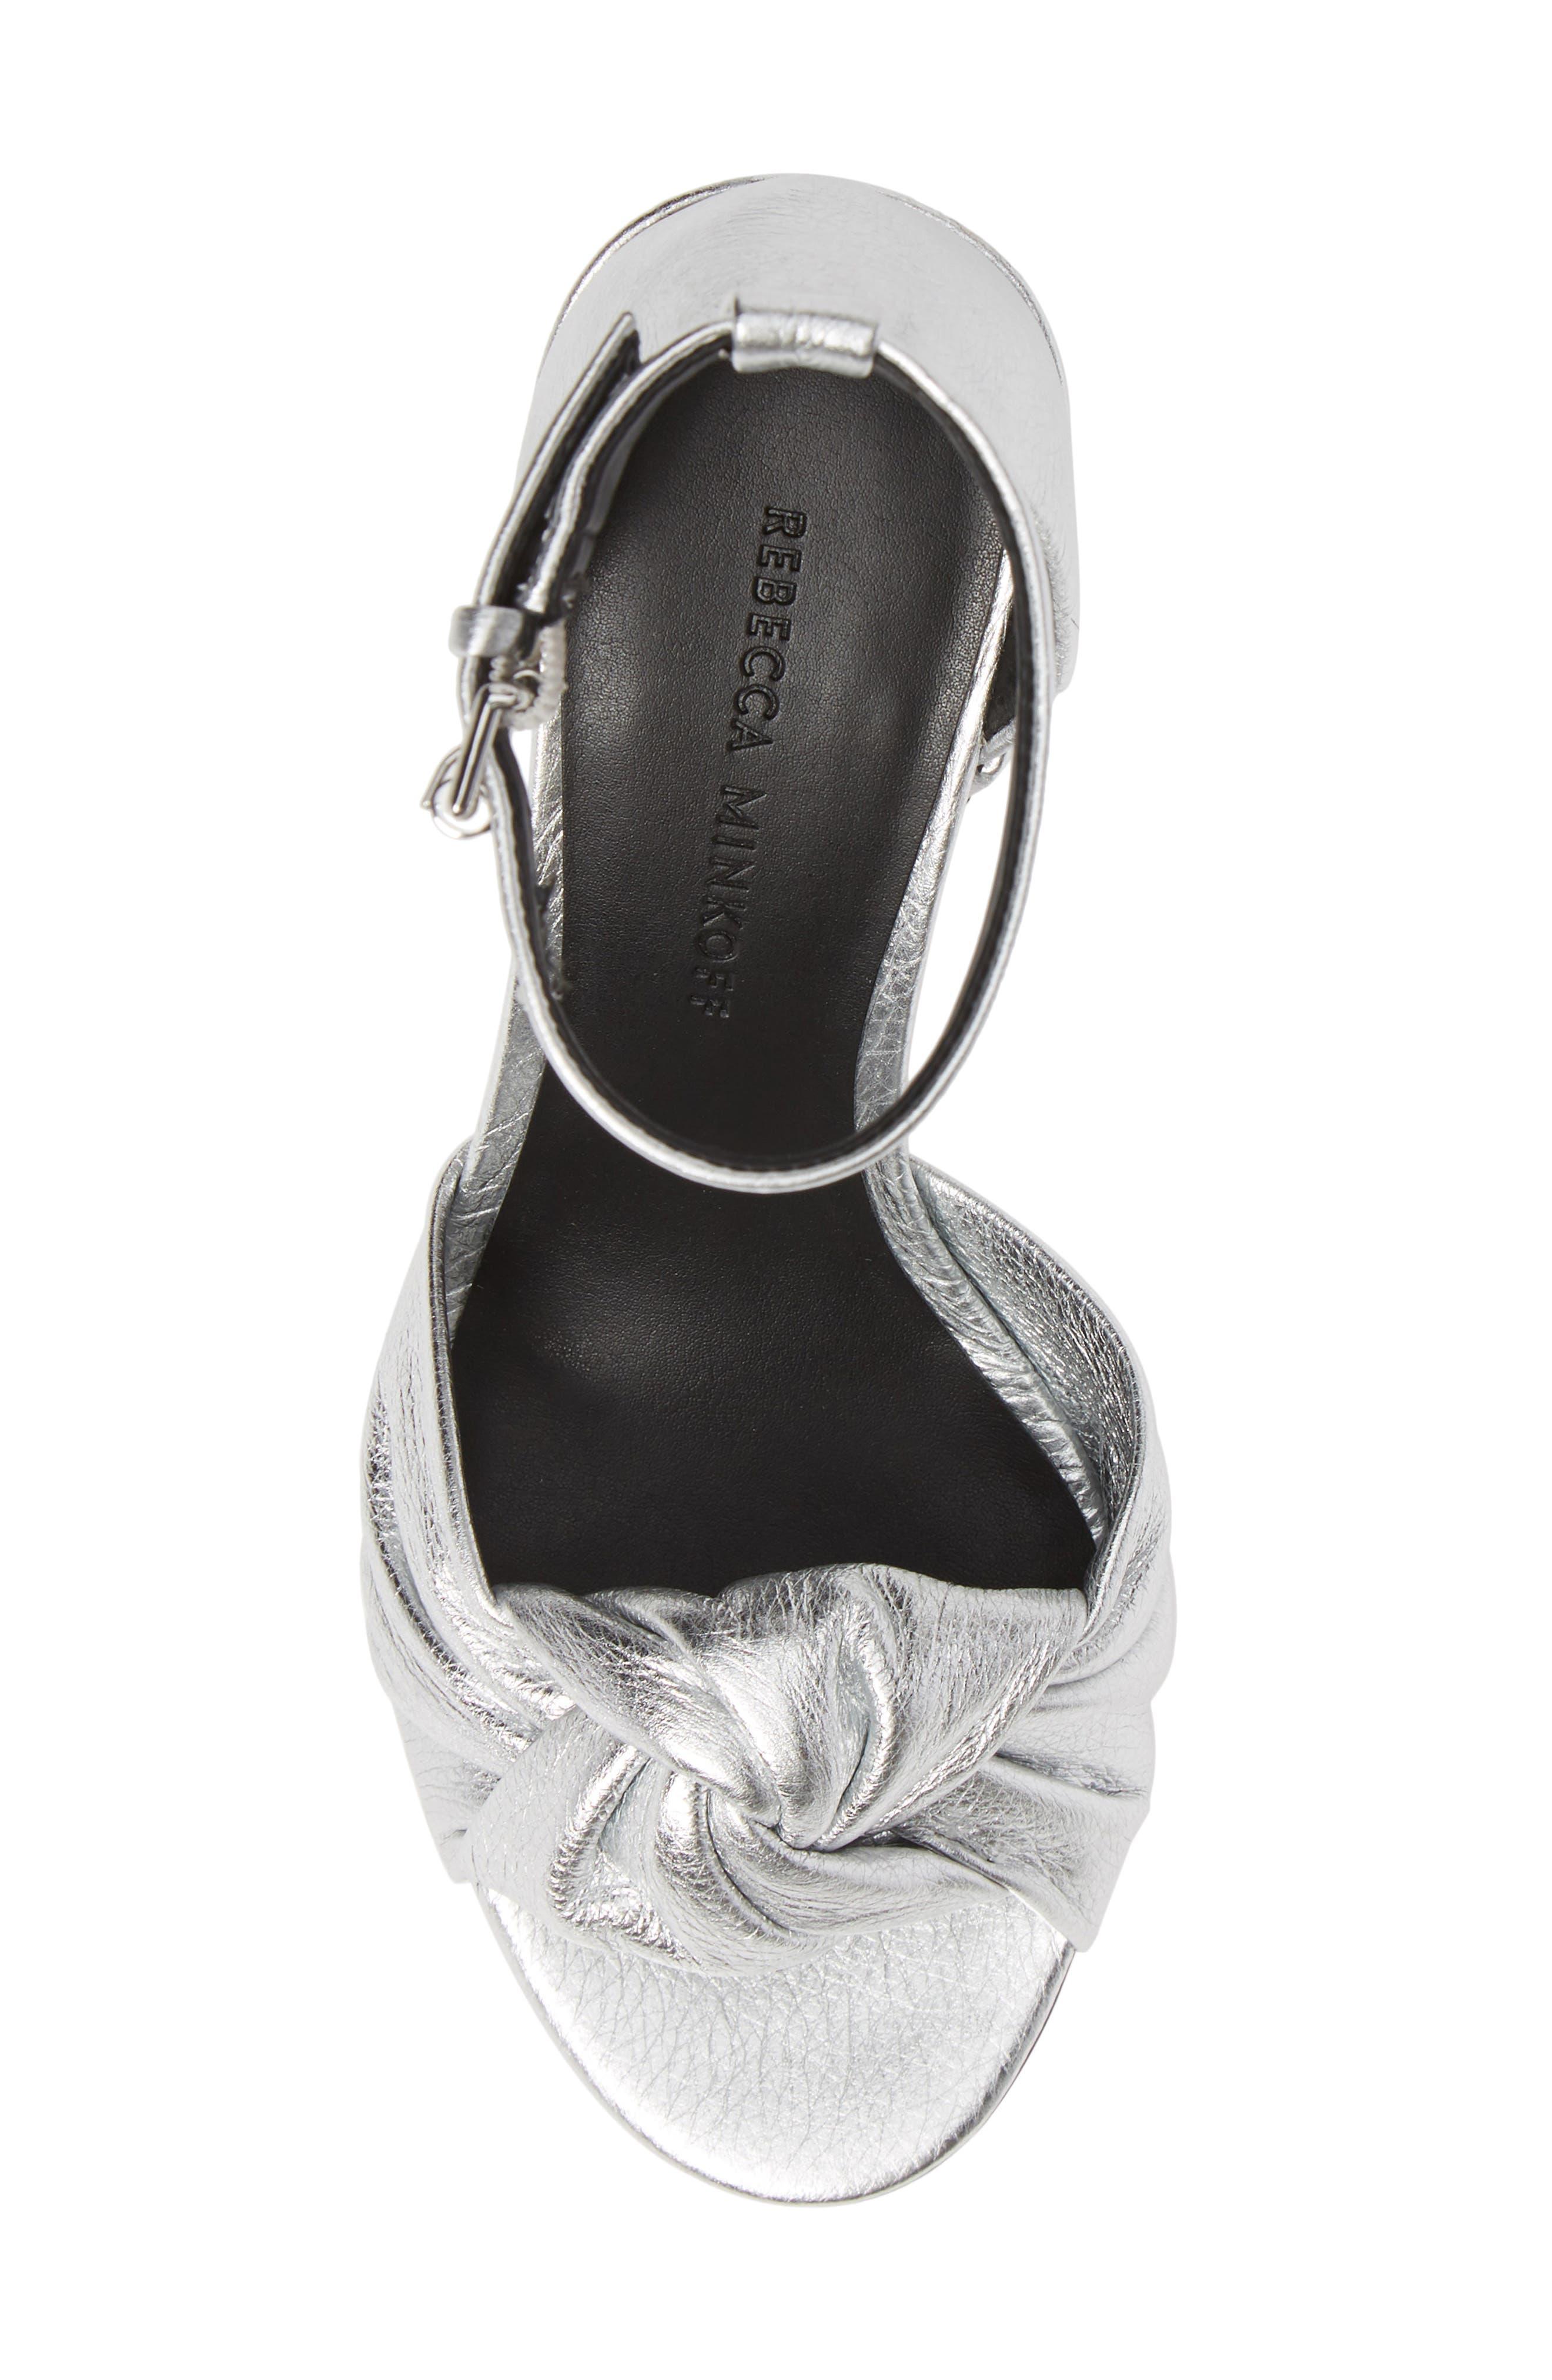 REBECCA MINKOFF, Capriana Ankle Strap Sandal, Alternate thumbnail 5, color, SILVER LEATHER